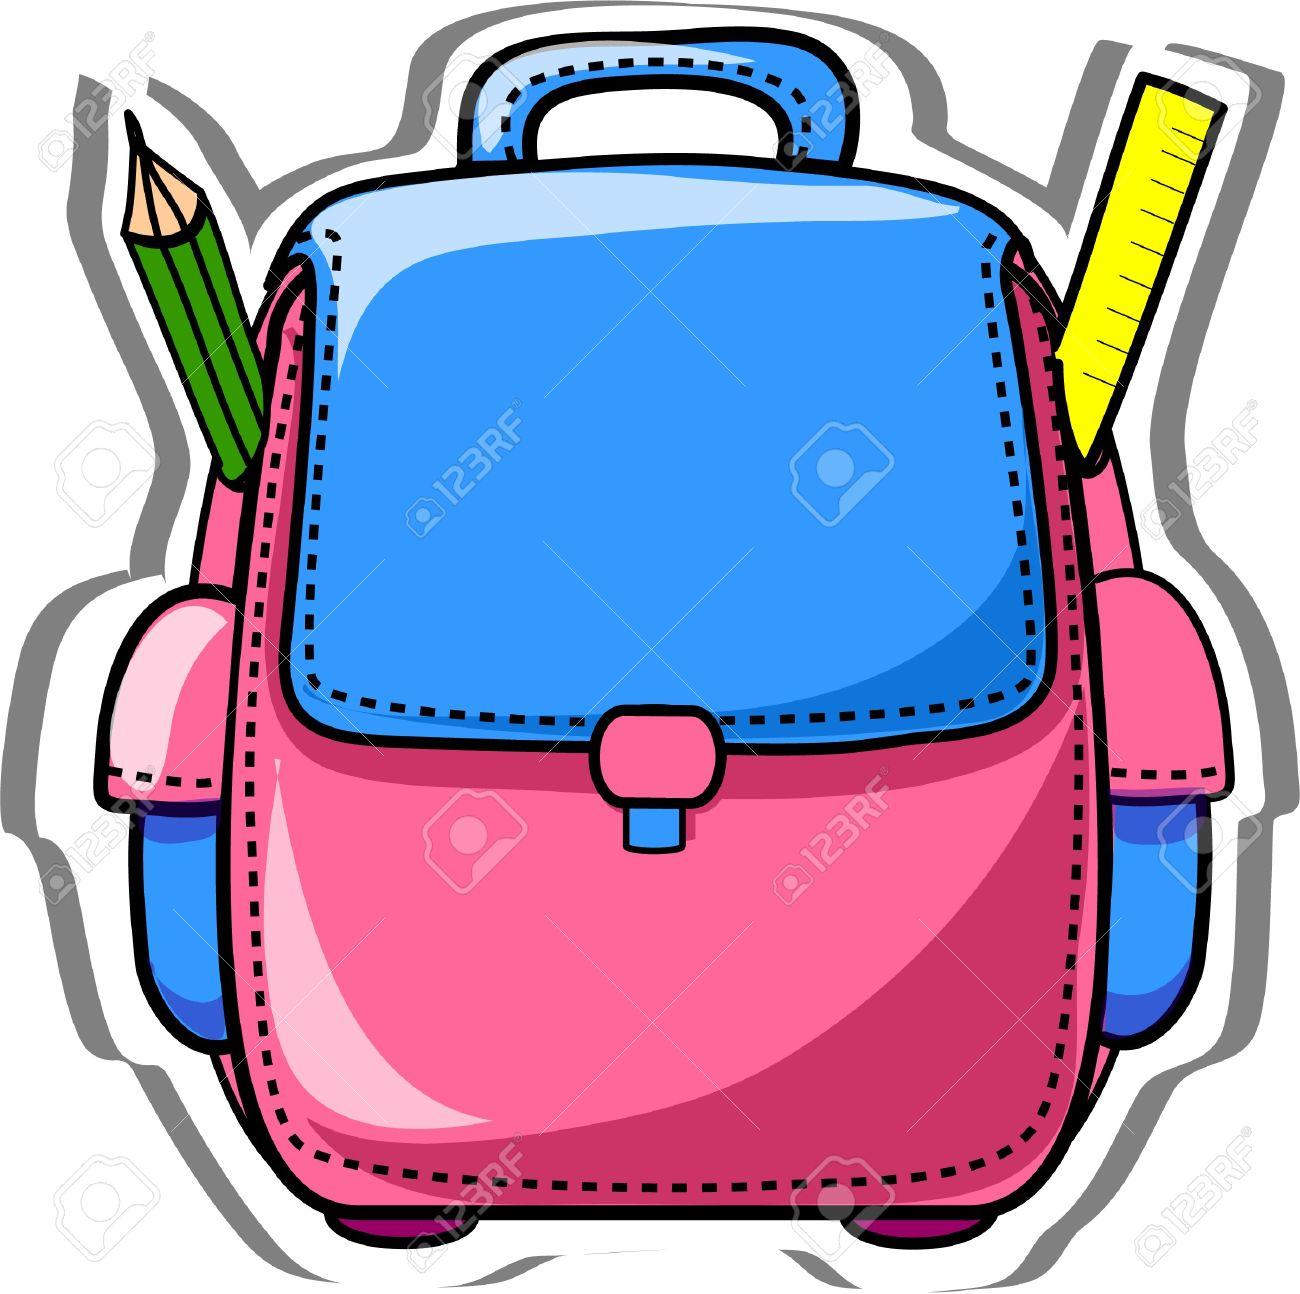 Book bags clipart.